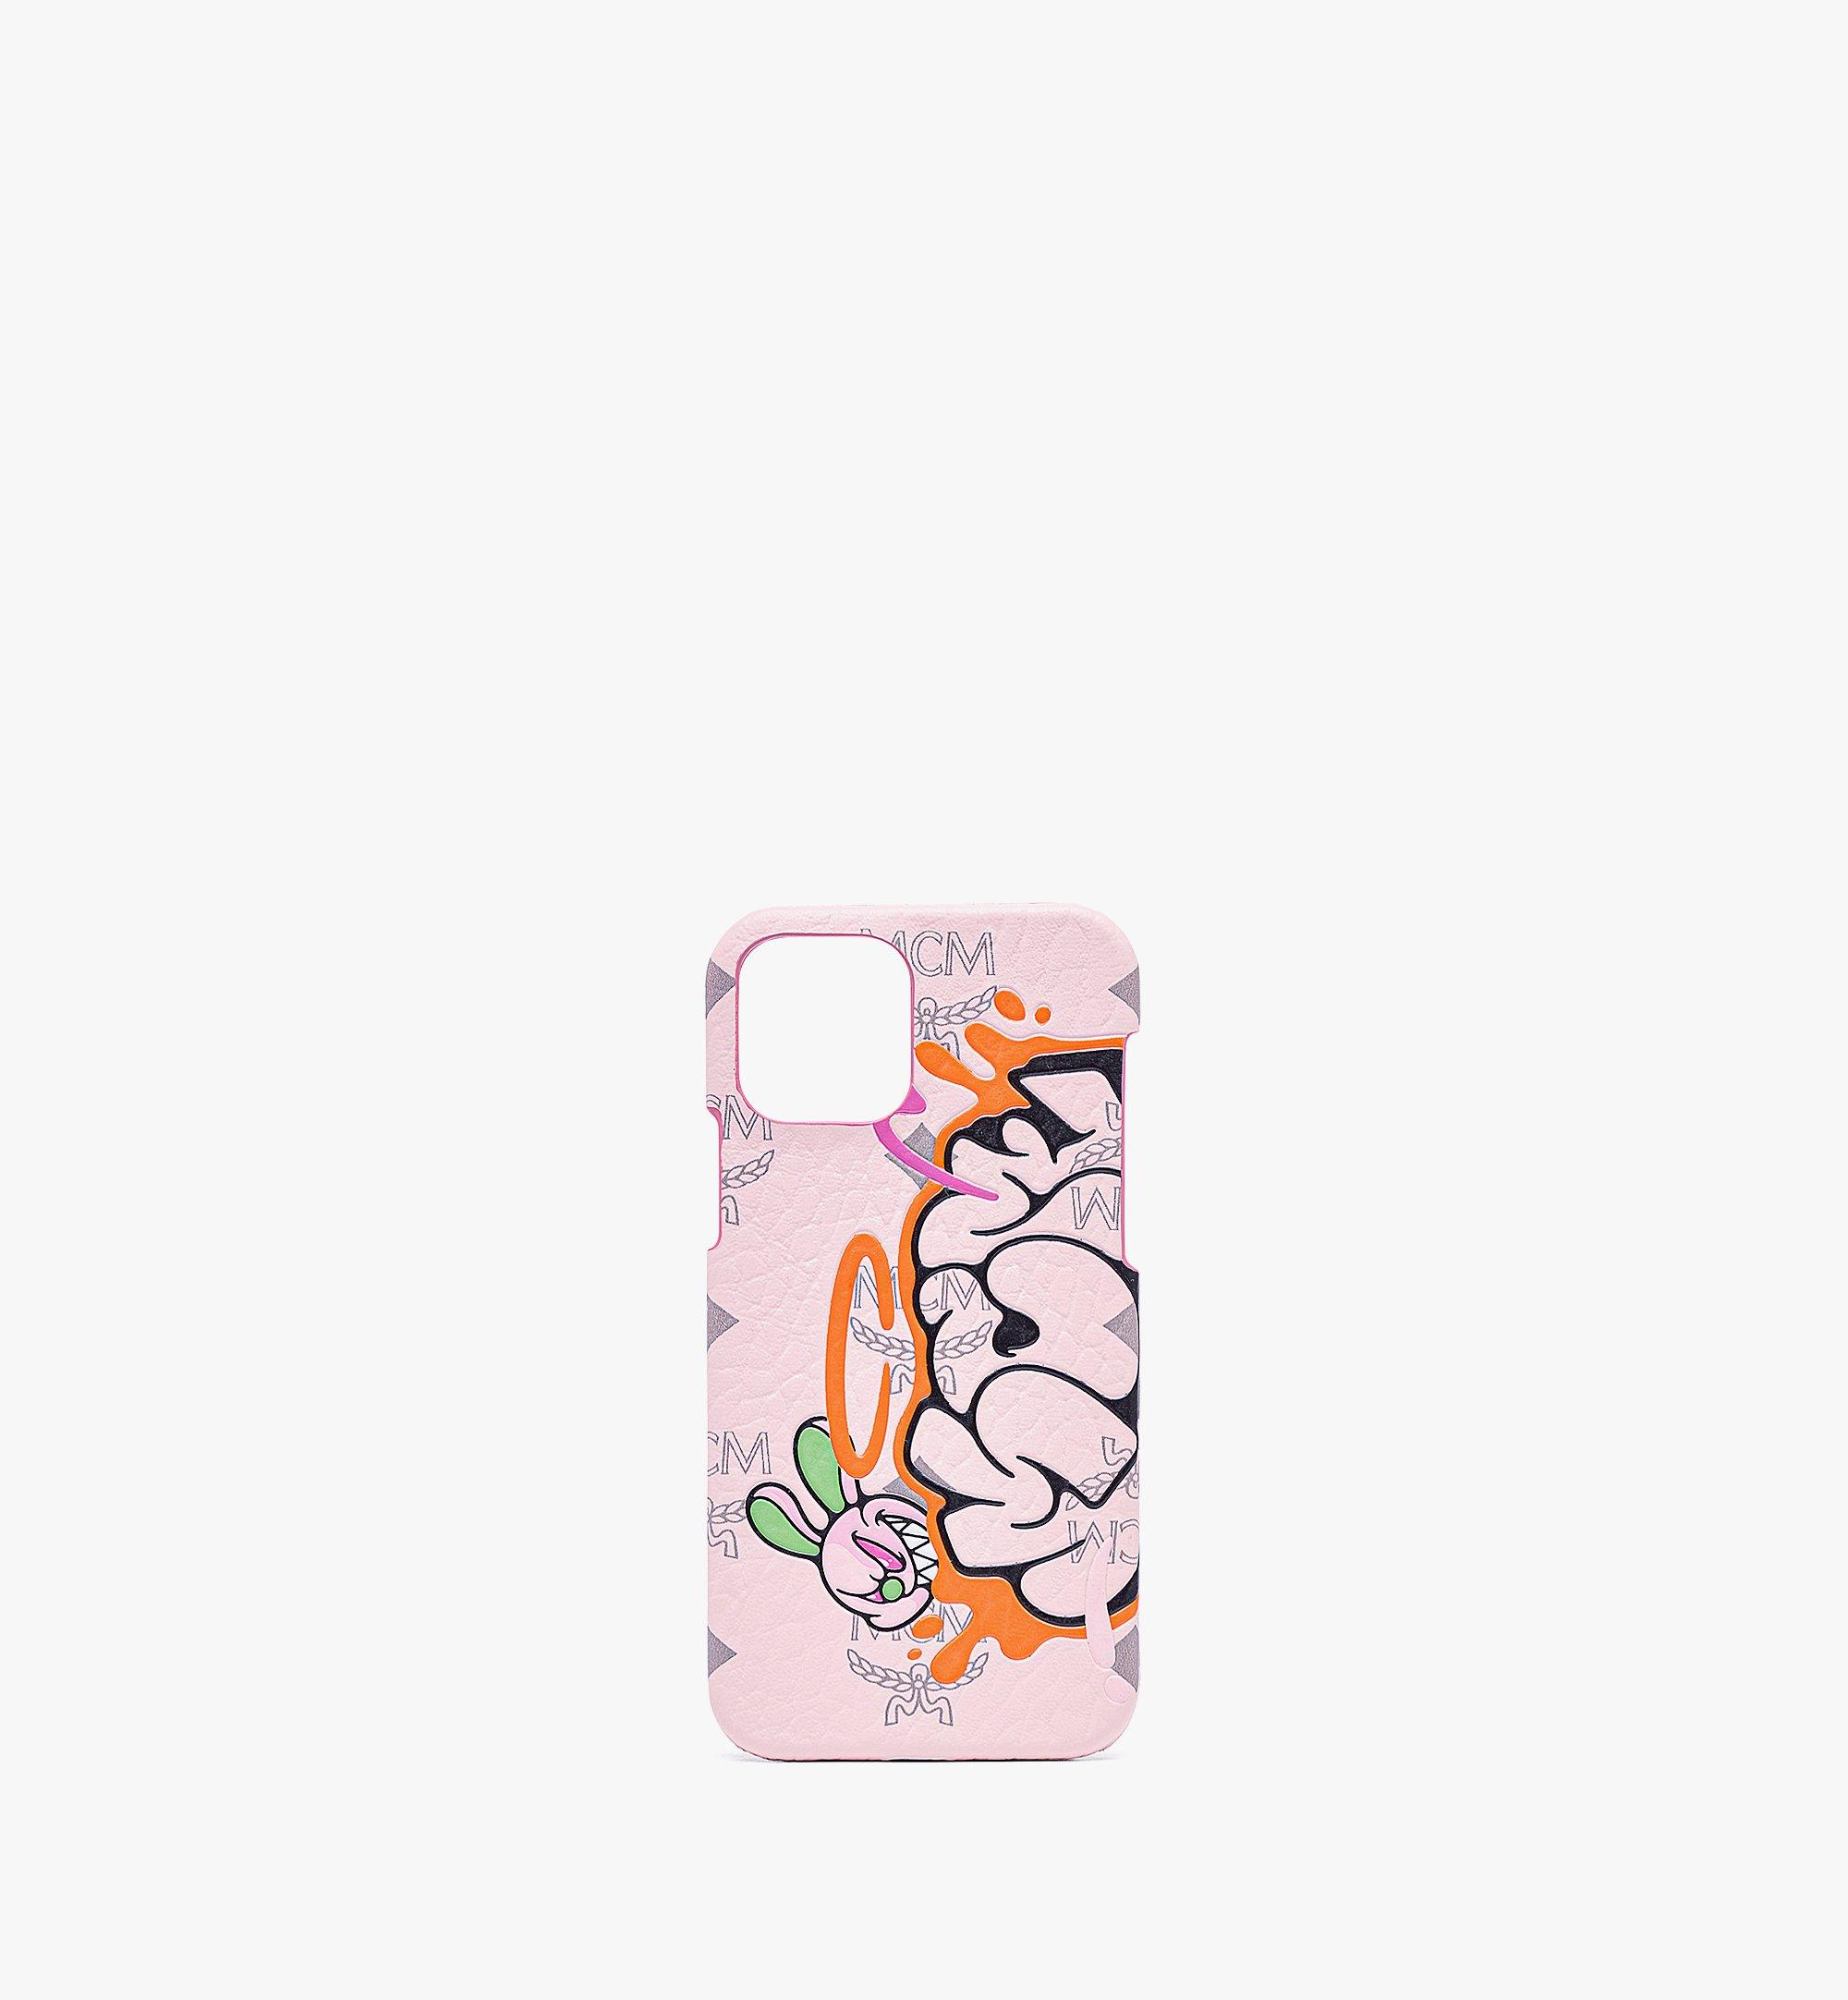 MCM MCM x SAMBYPEN iPhone 12/12 Pro Case in Visetos Pink MXEBASP03QH001 Alternate View 1